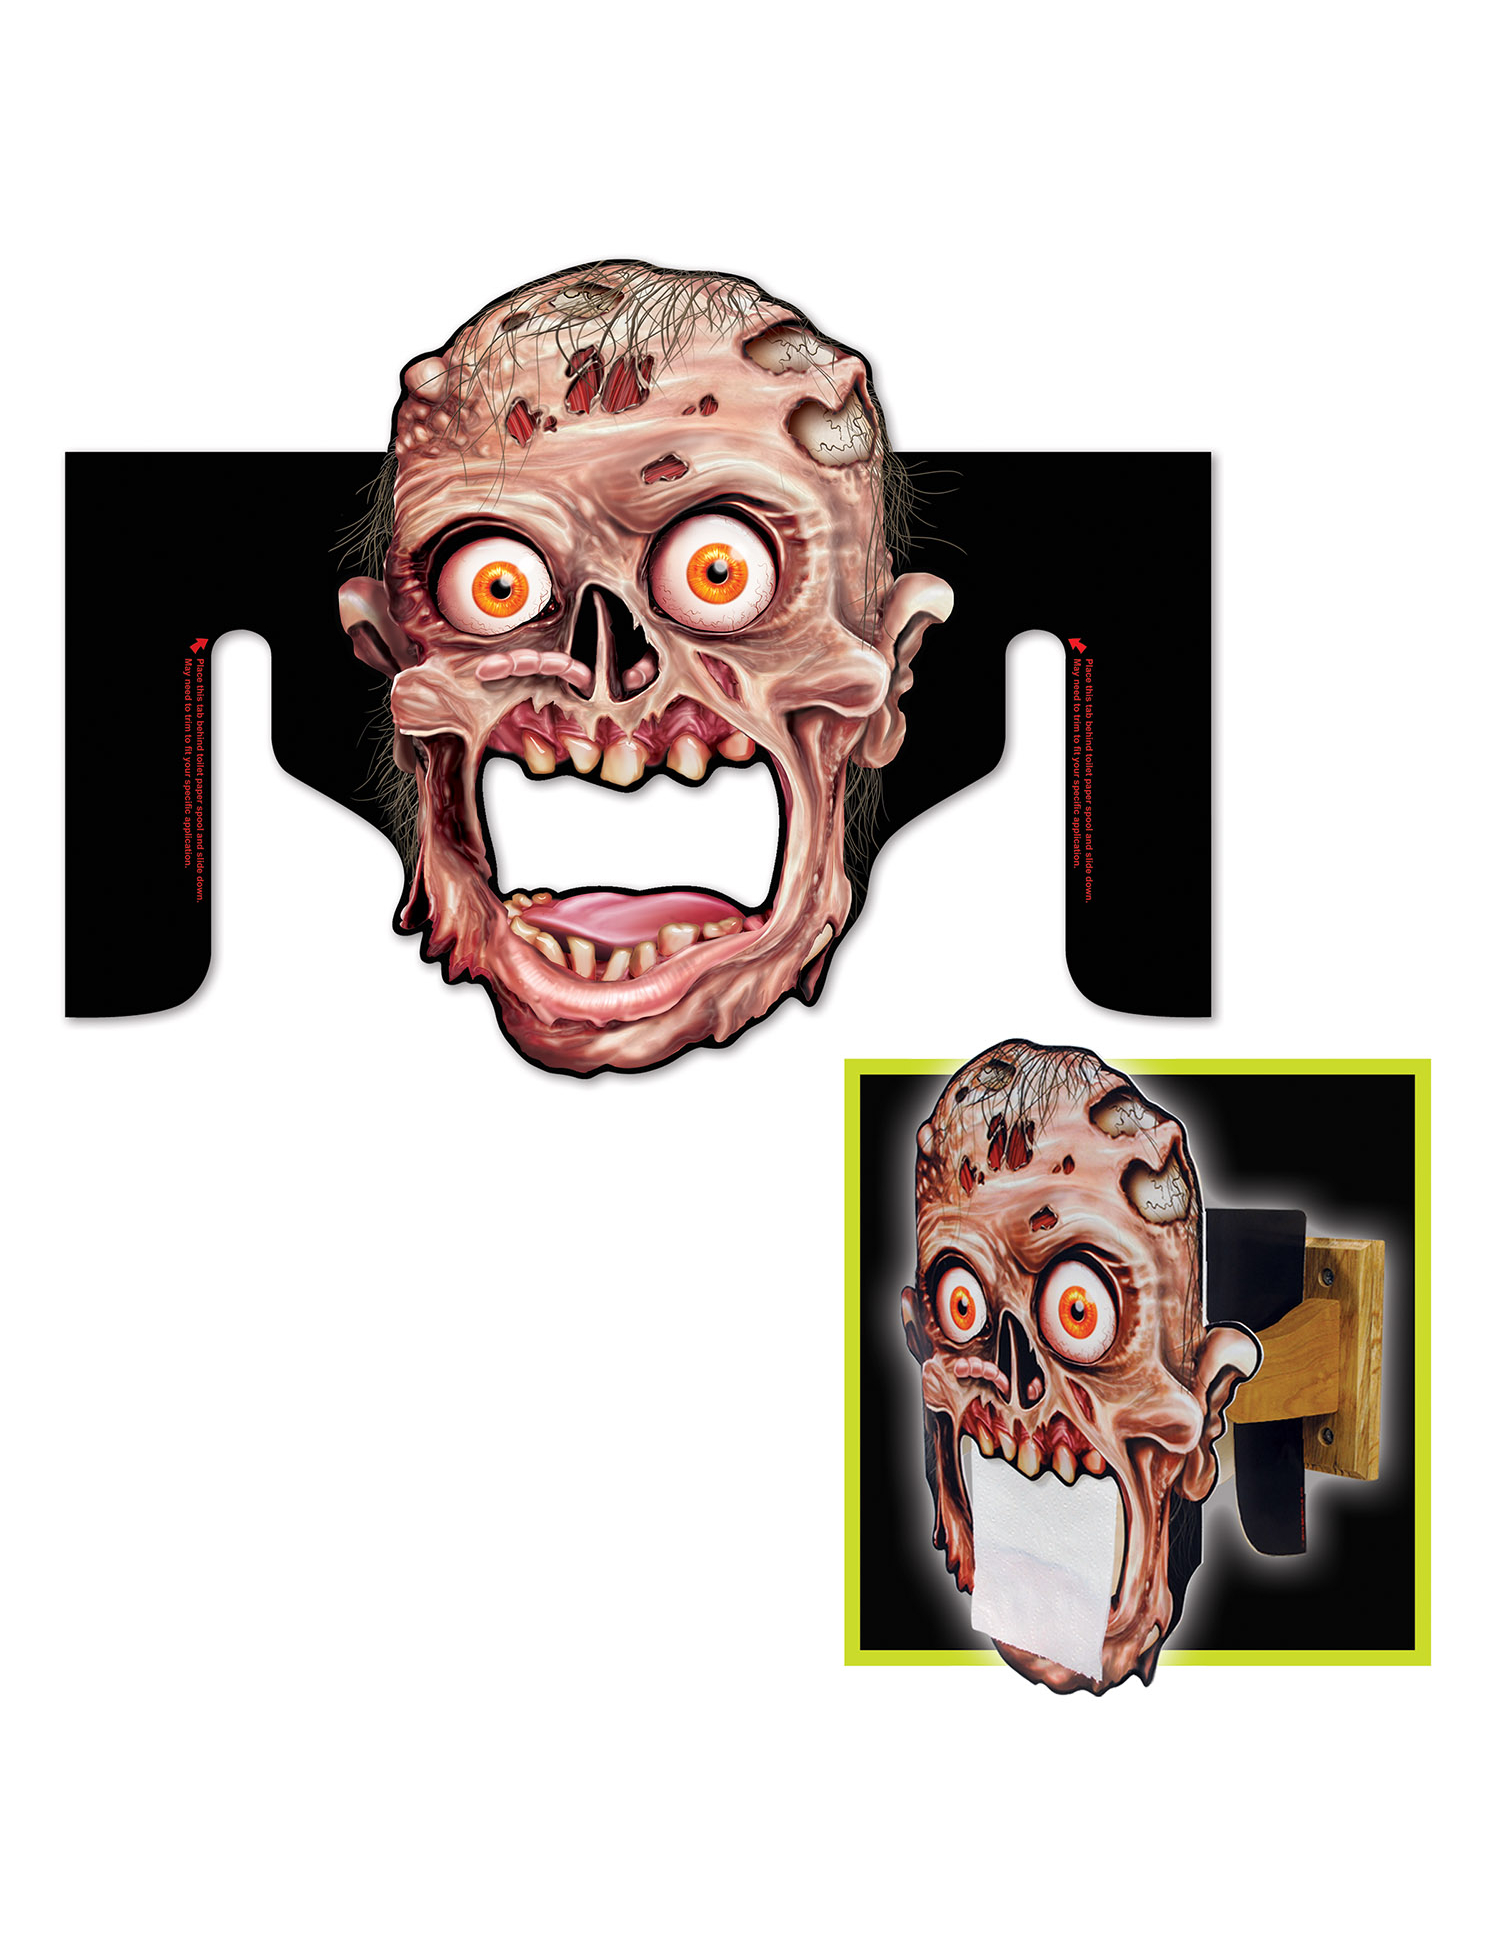 Porta carta igienica zombie halloween addobbi e vestiti - Albero porta carta igienica ...